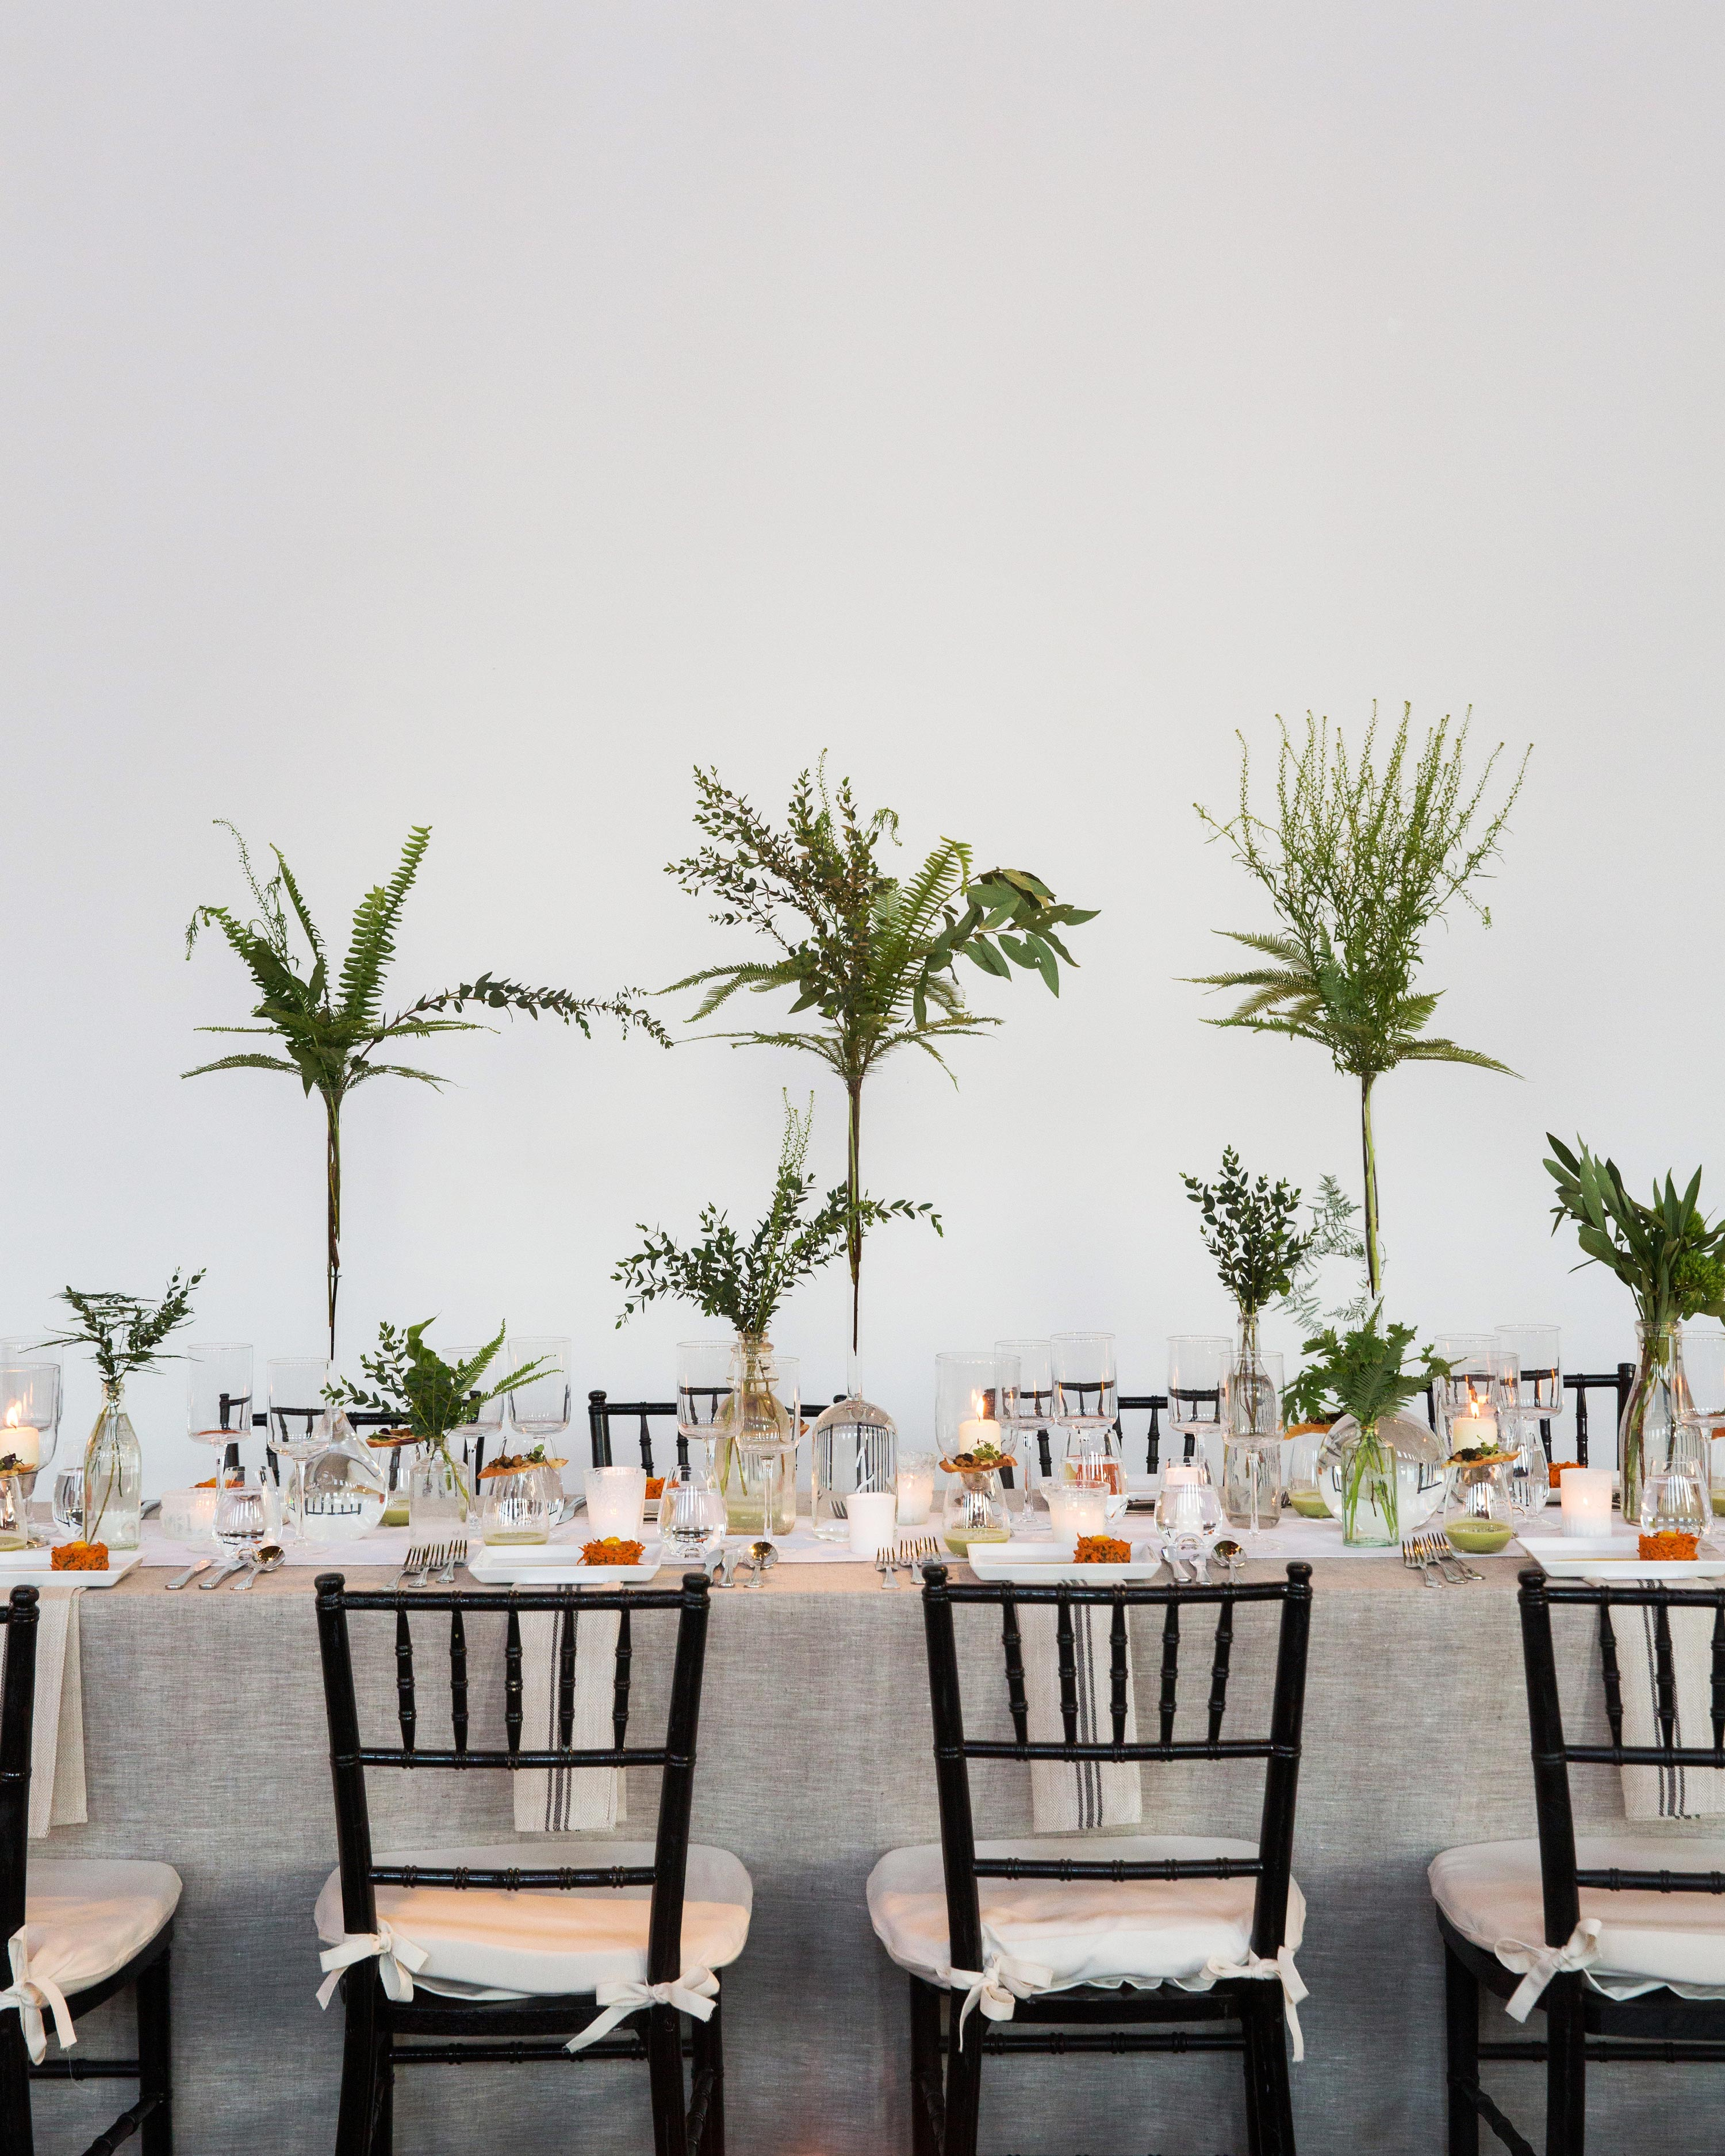 emily-josh-wedding-table-0250-s112719-0216.jpg